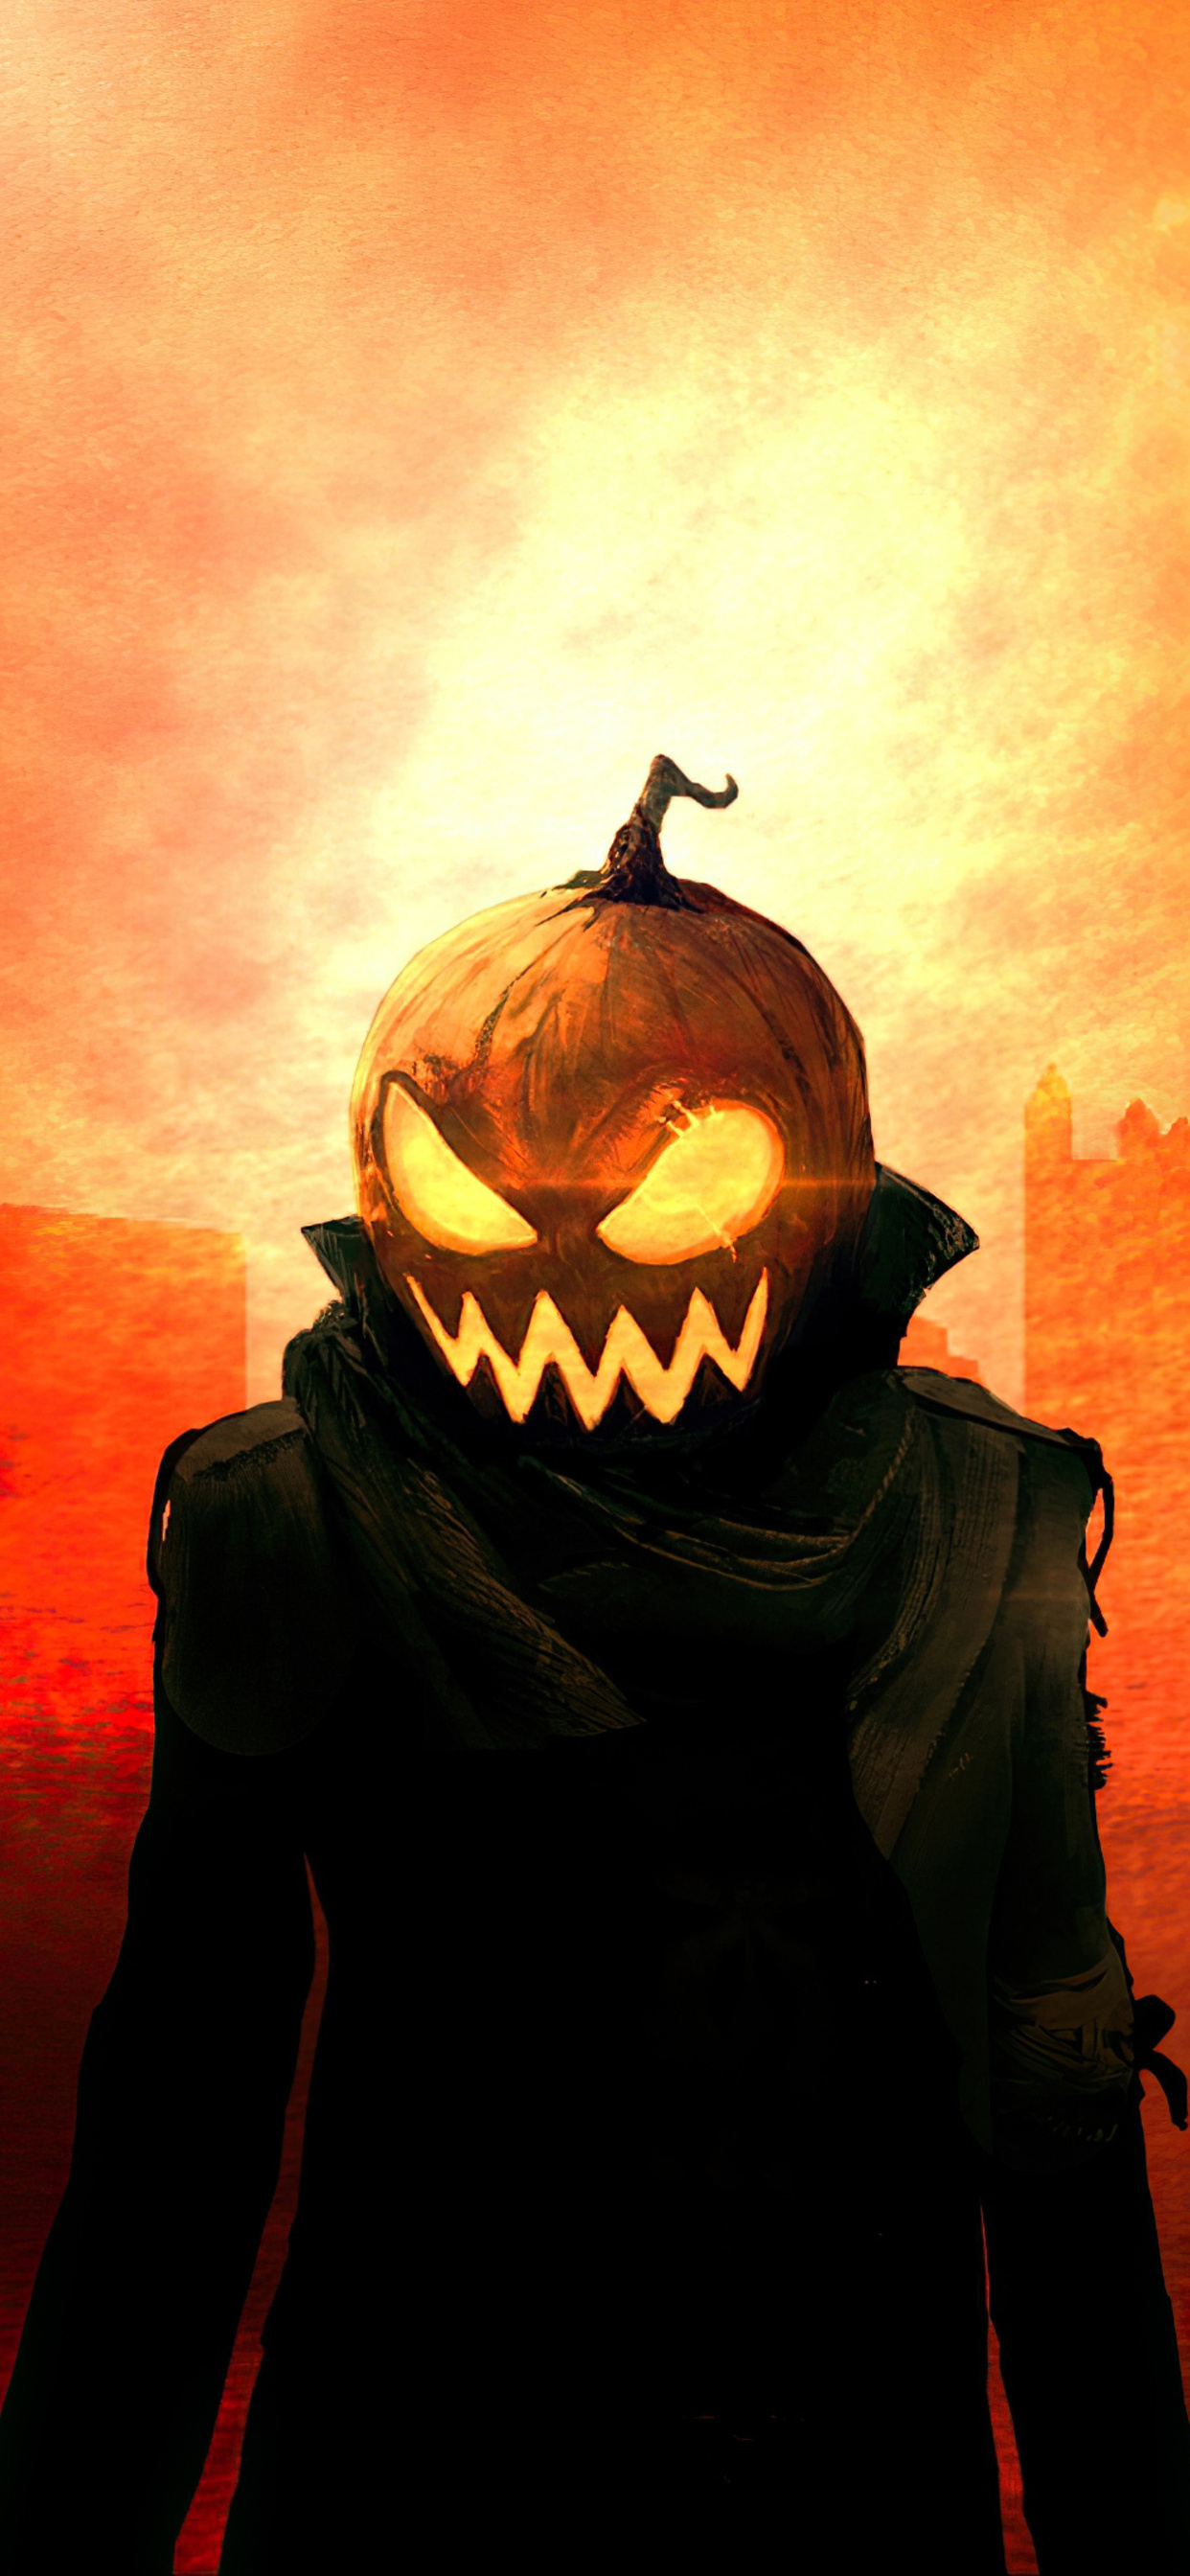 the-last-halloween-4k-zv.jpg